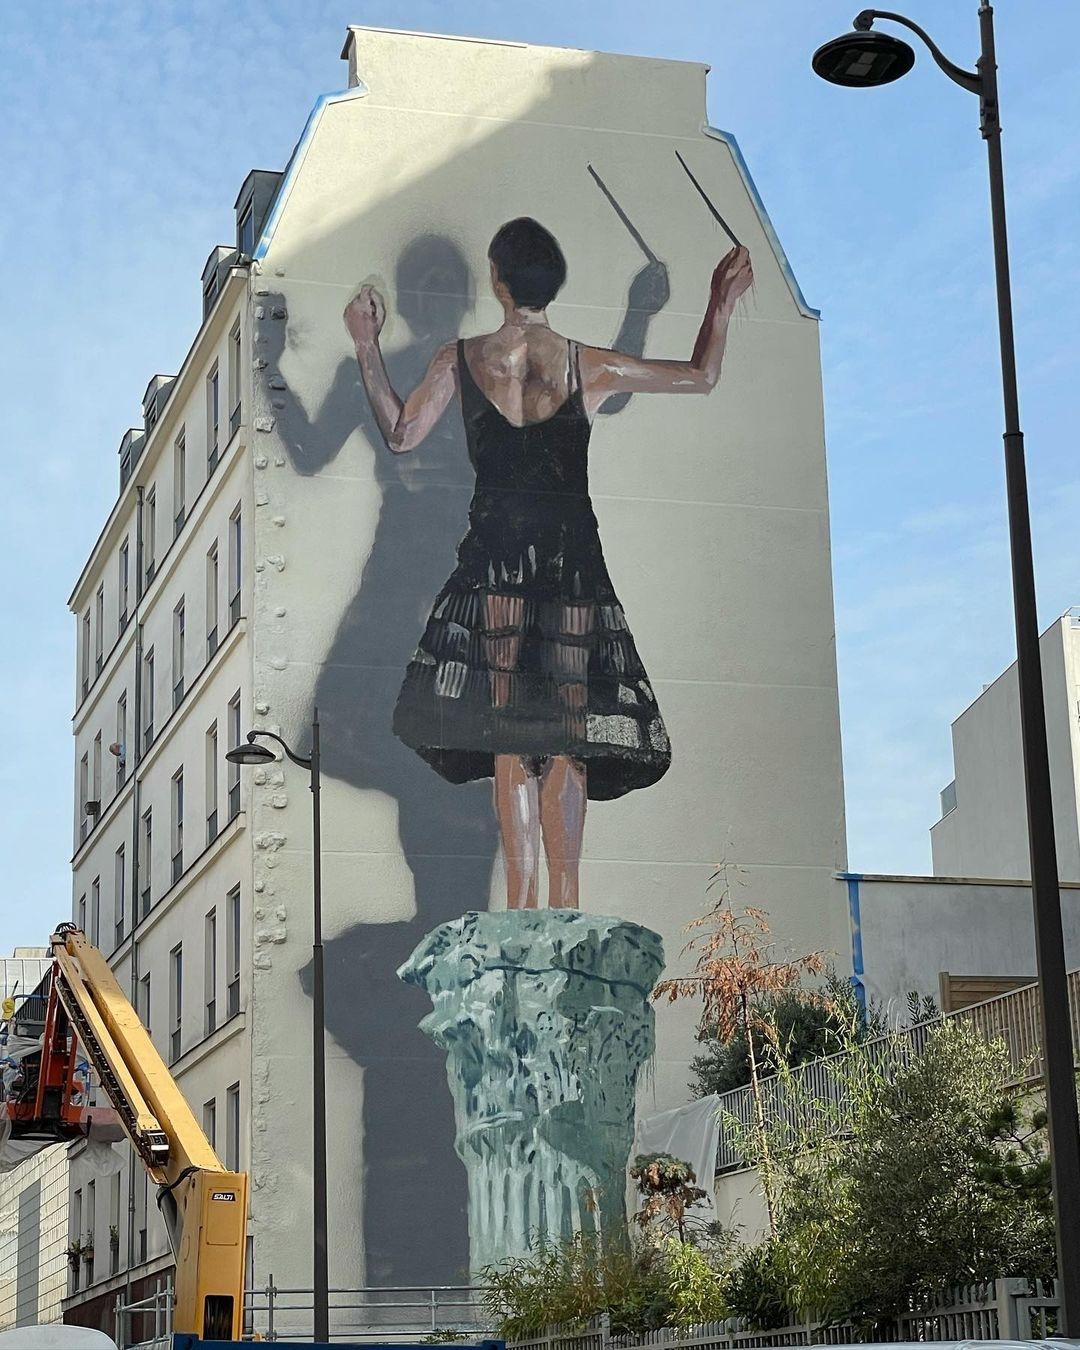 Hyuro by Axel Void + Escif @ Paris, France